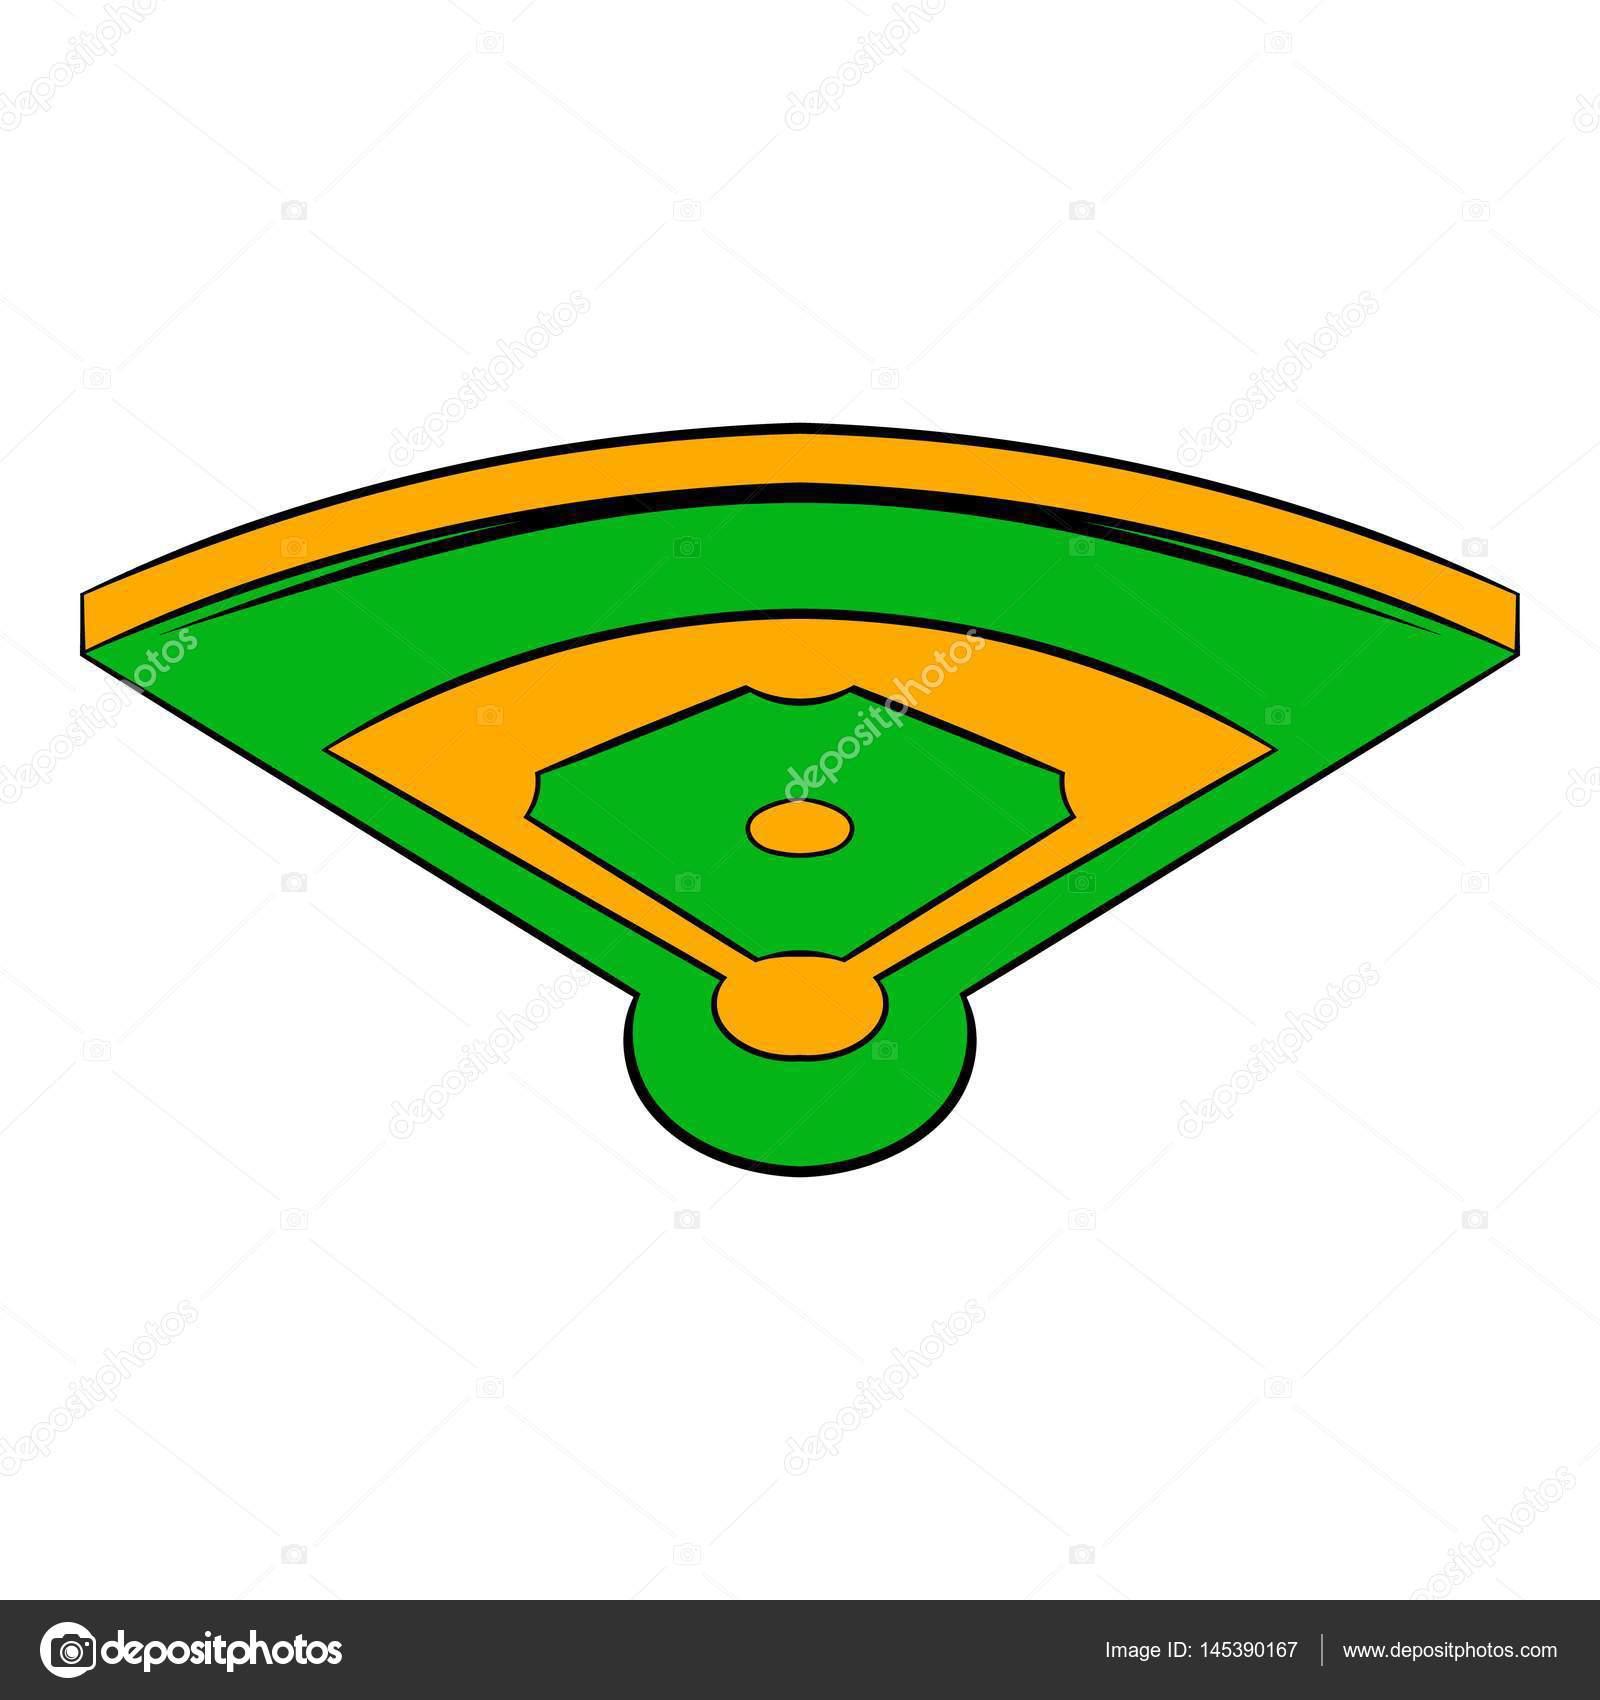 baseball field icon icon cartoon stock vector juliarstudio rh depositphotos com baseball field position vector baseball field vector art